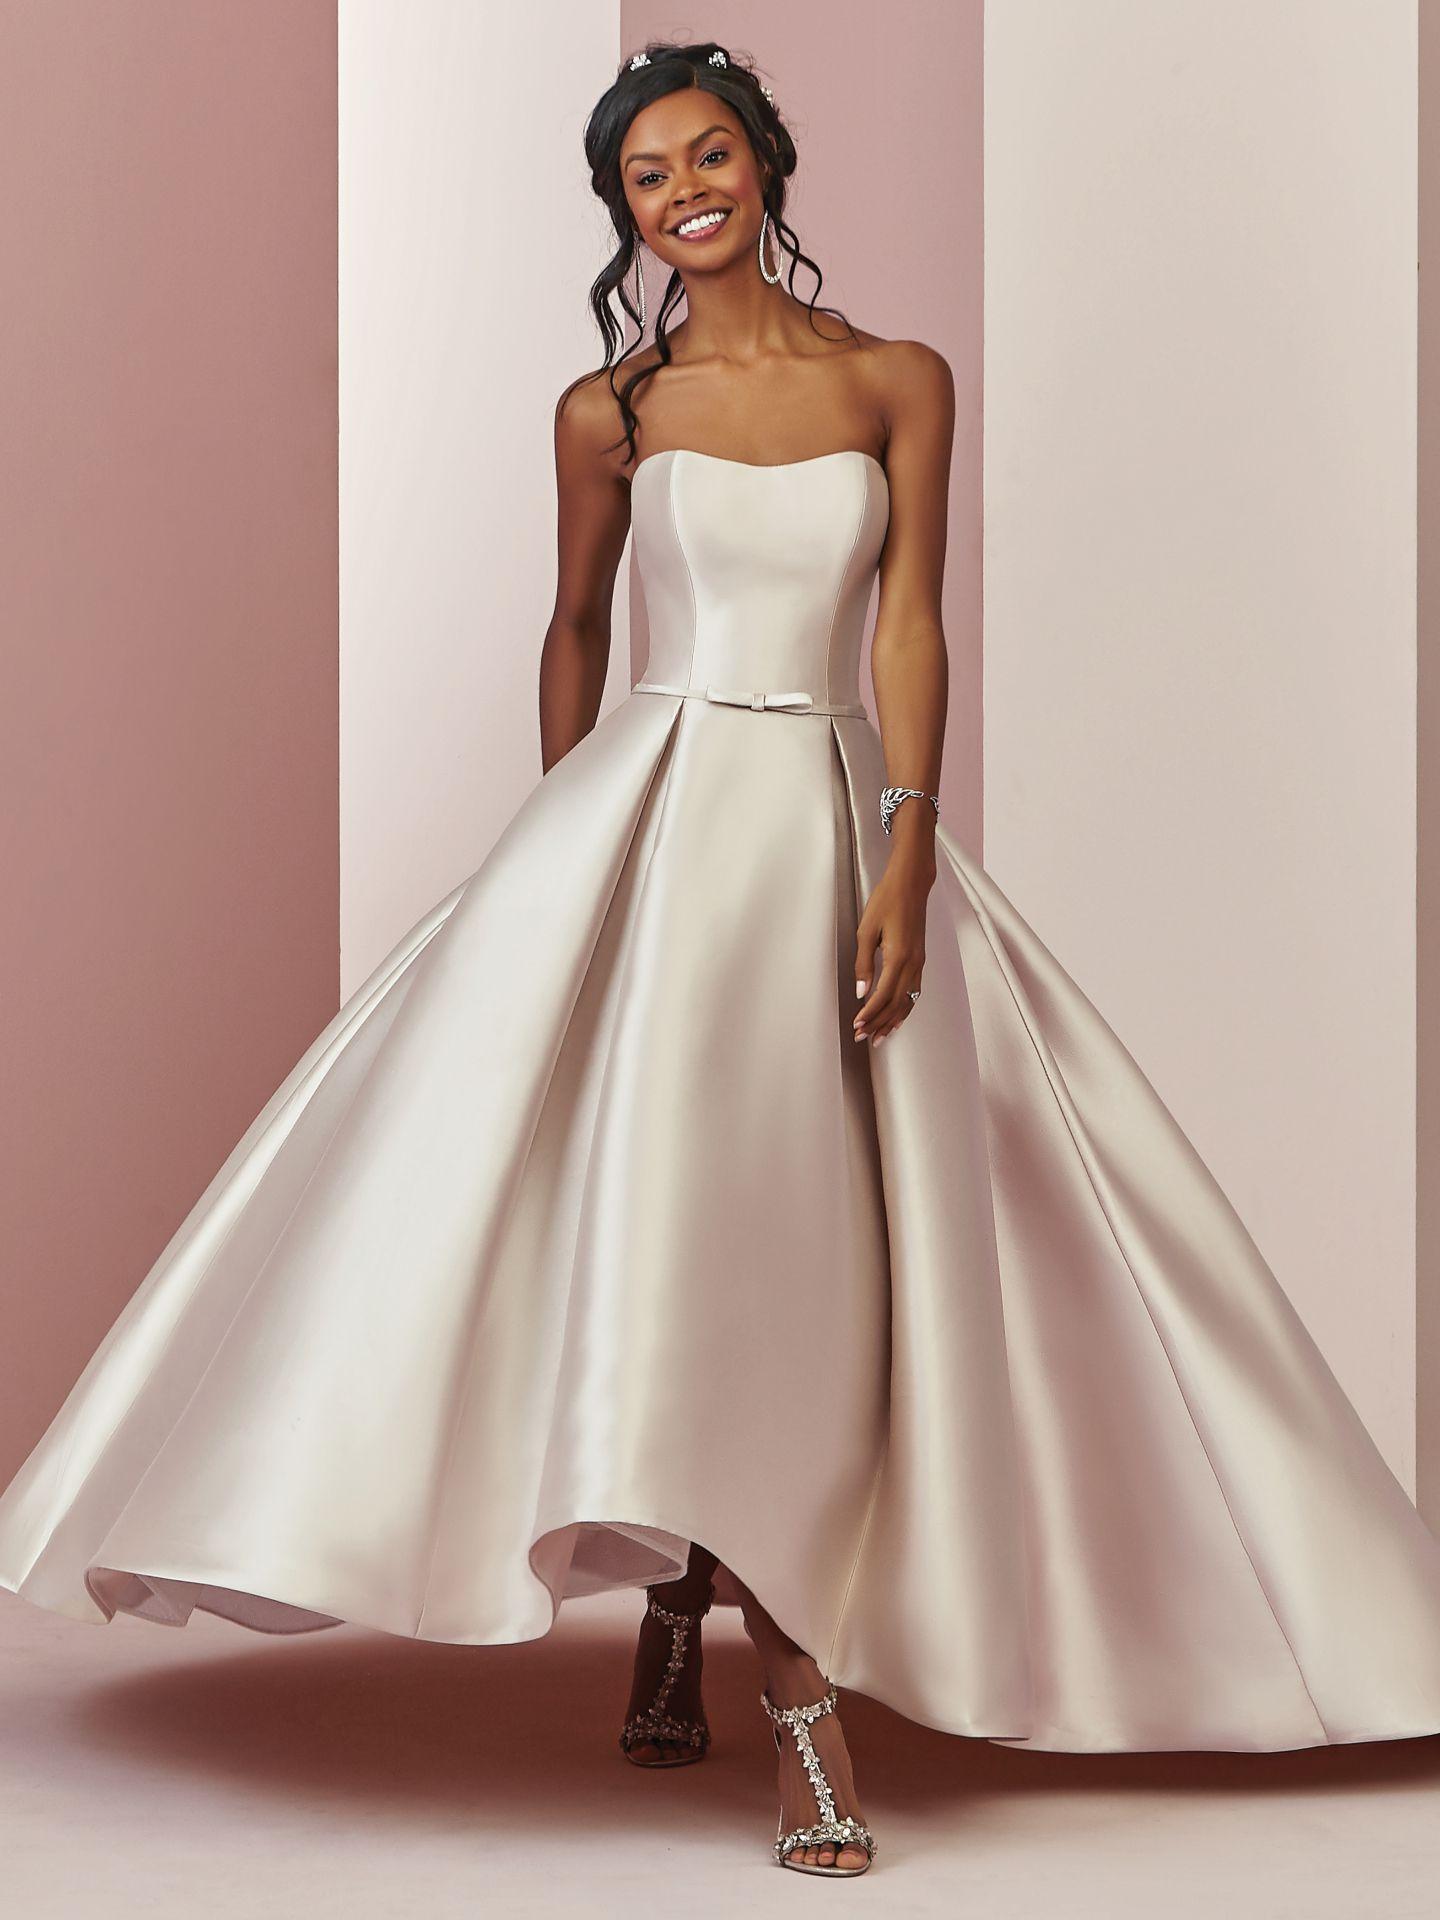 Erica by rebecca ingram wedding dresses wedding gown